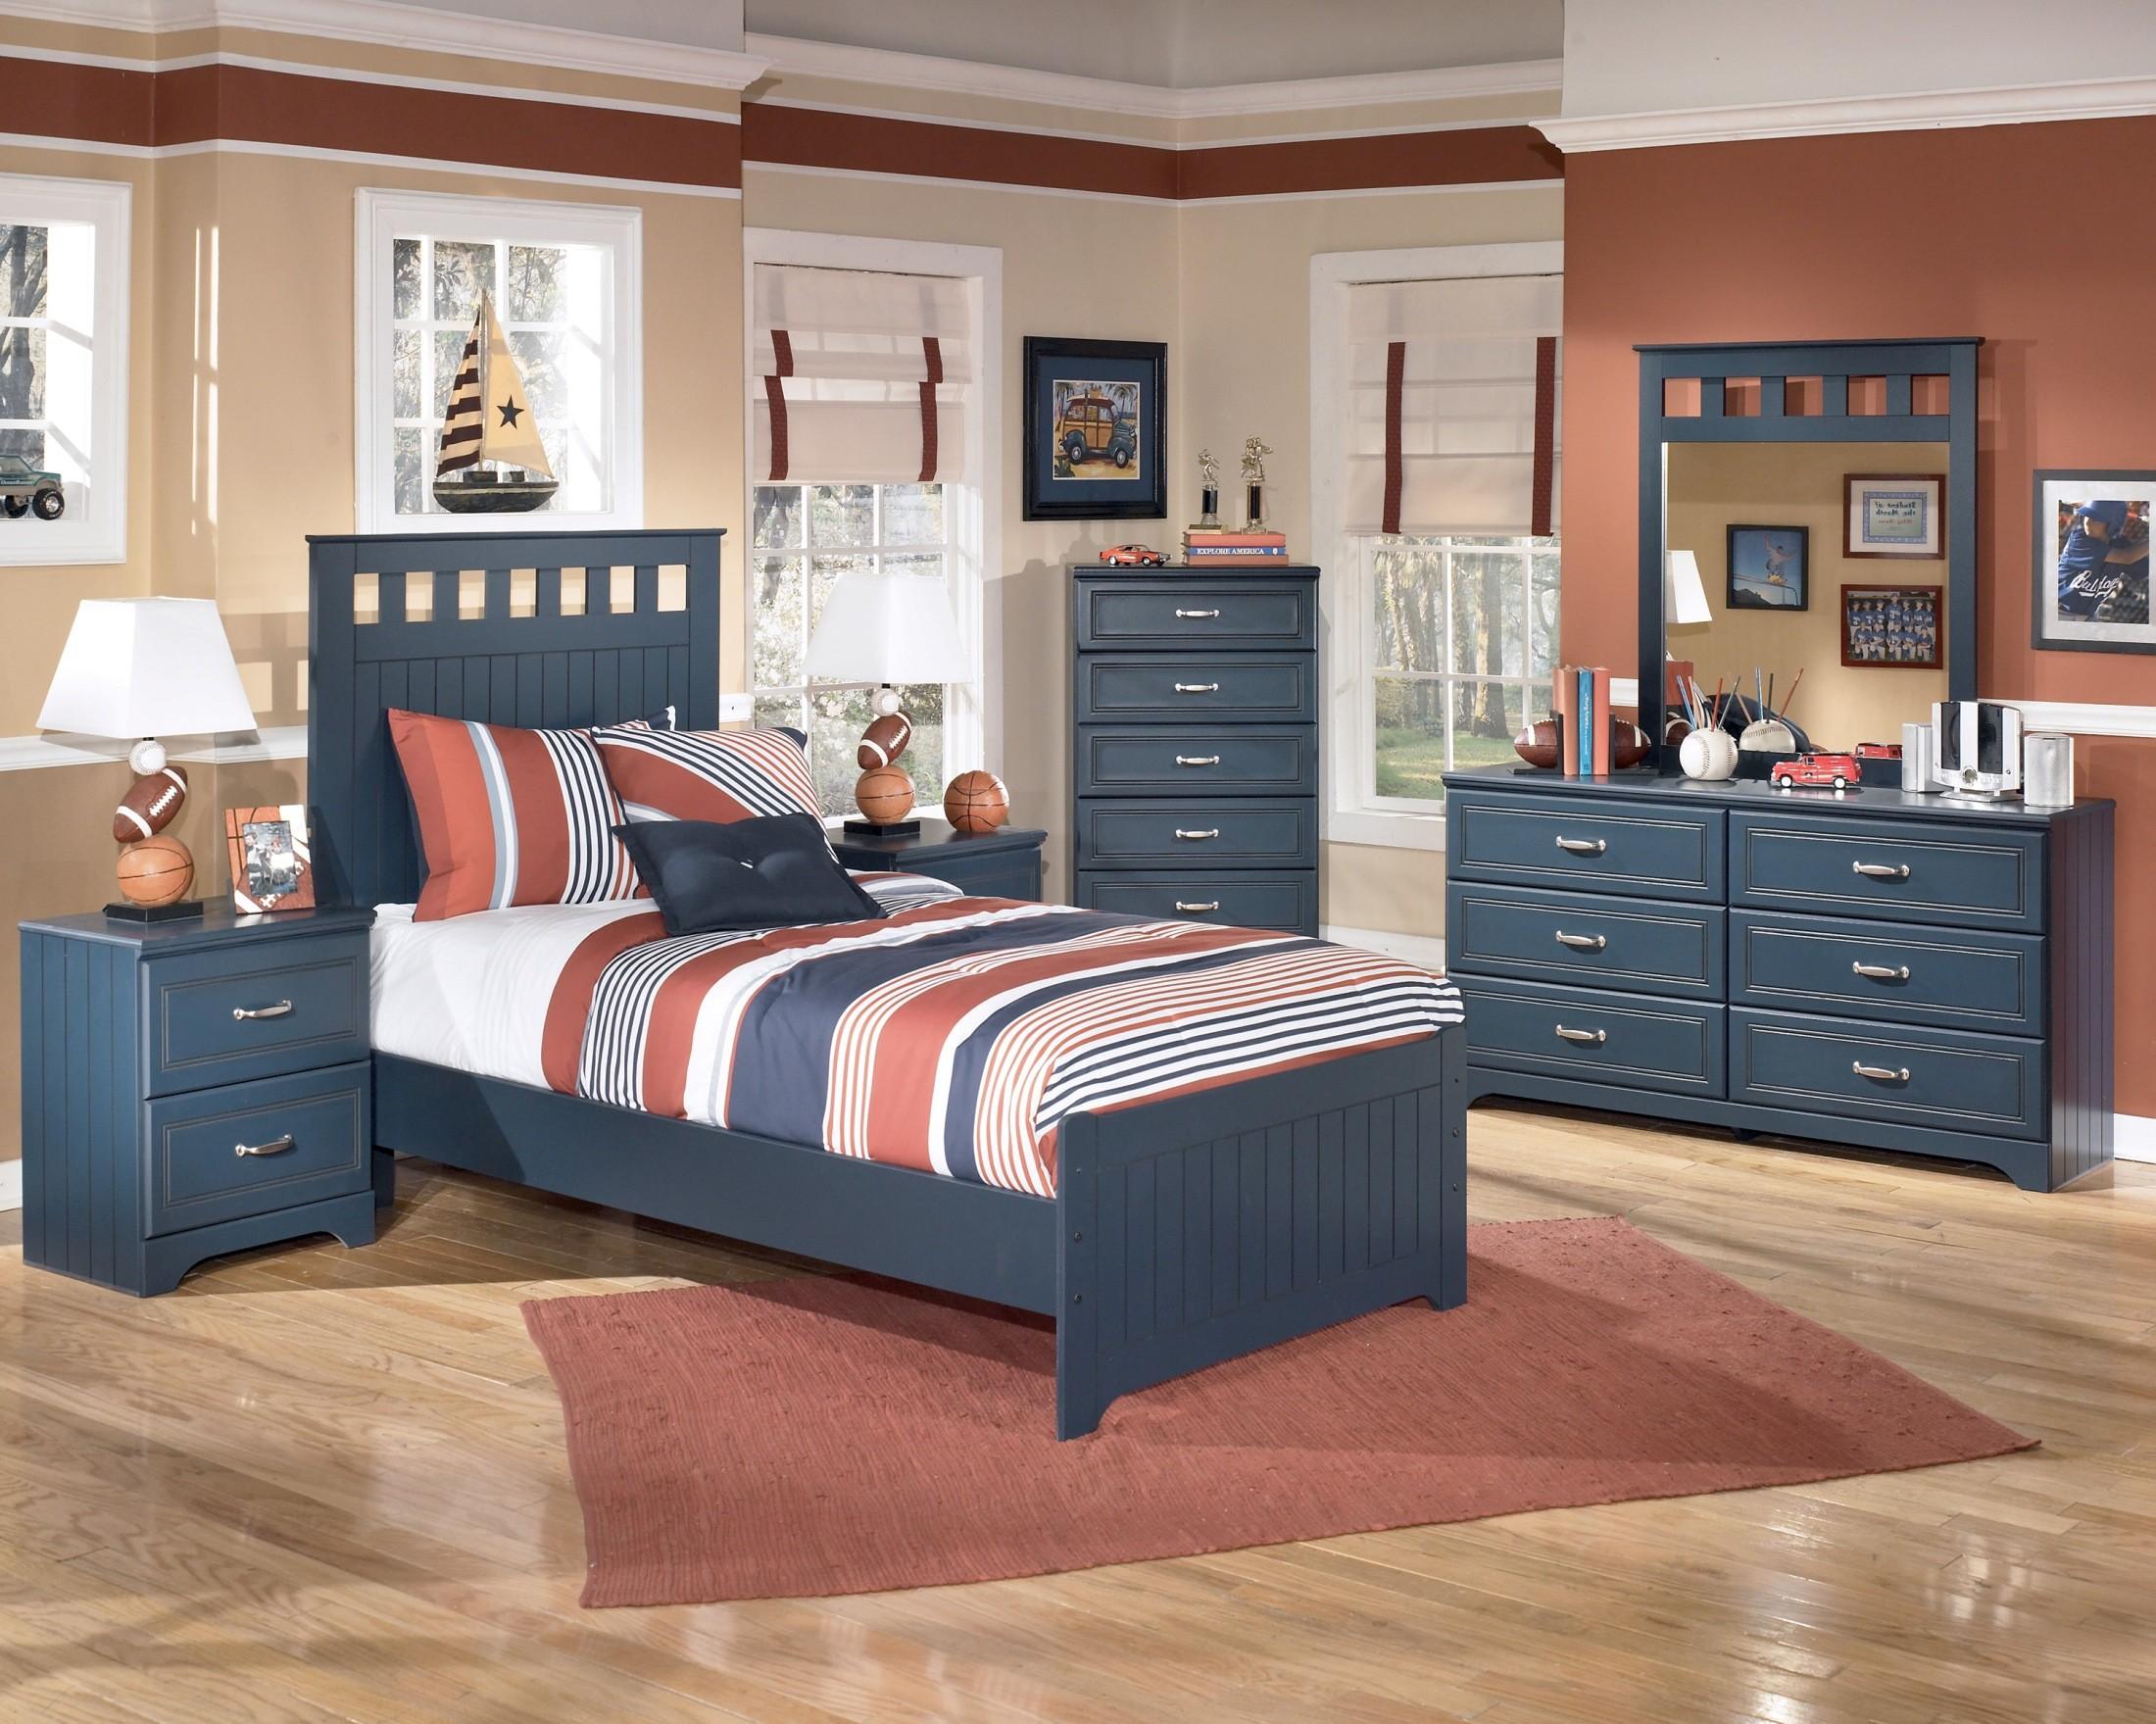 Kids Full Size Bedroom Furniture Sets Leo Youth Panel Bedroom Set From Ashley B103 51 Coleman Furniture